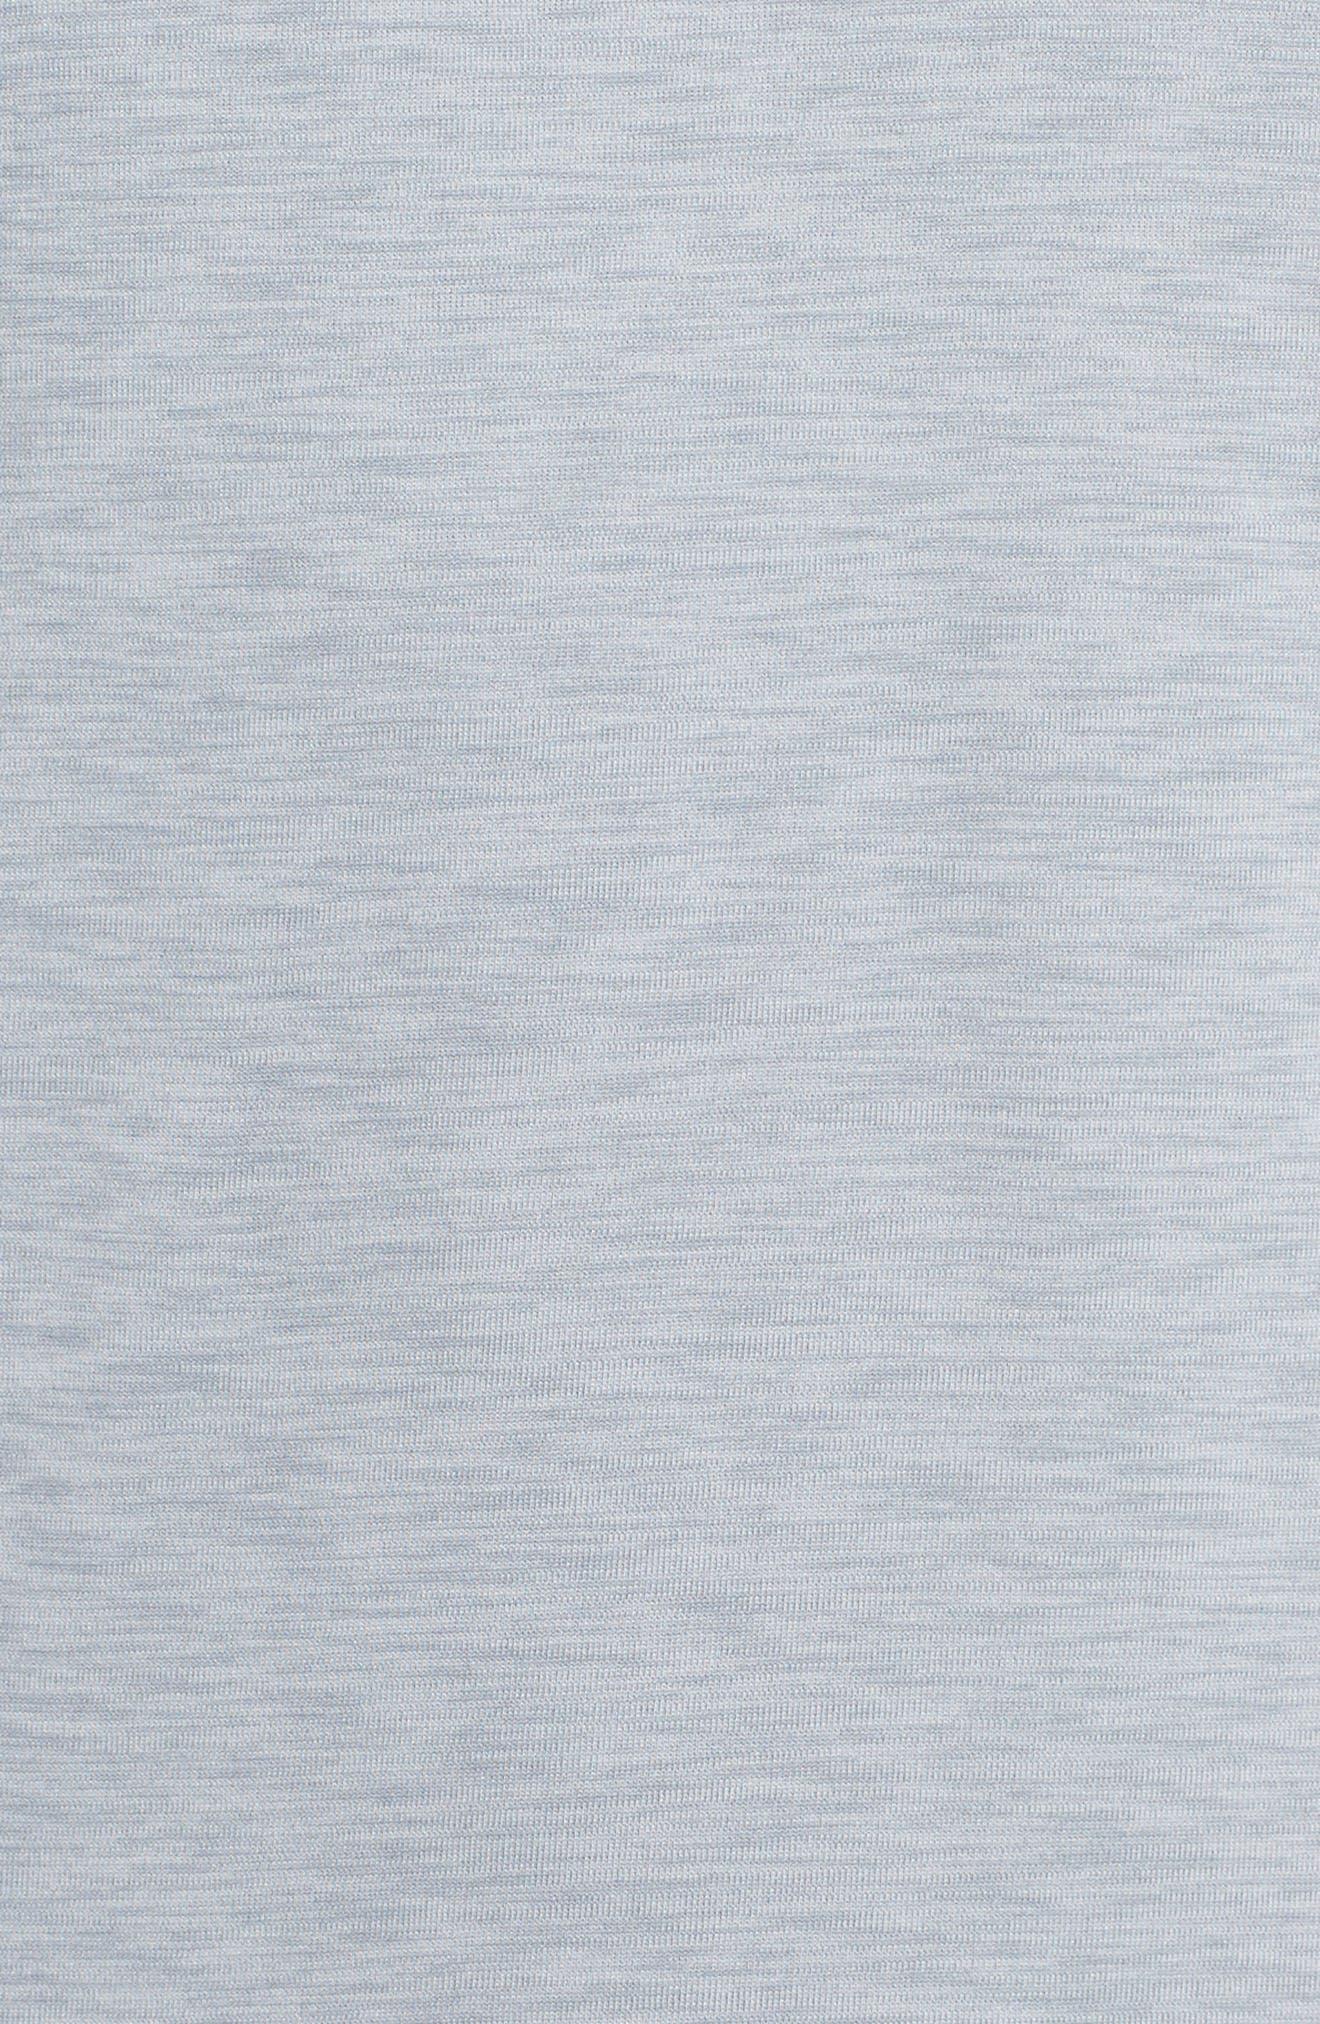 Hyper Dry Training Tee,                             Alternate thumbnail 5, color,                             Pure Platinum/ Stealth/ Black